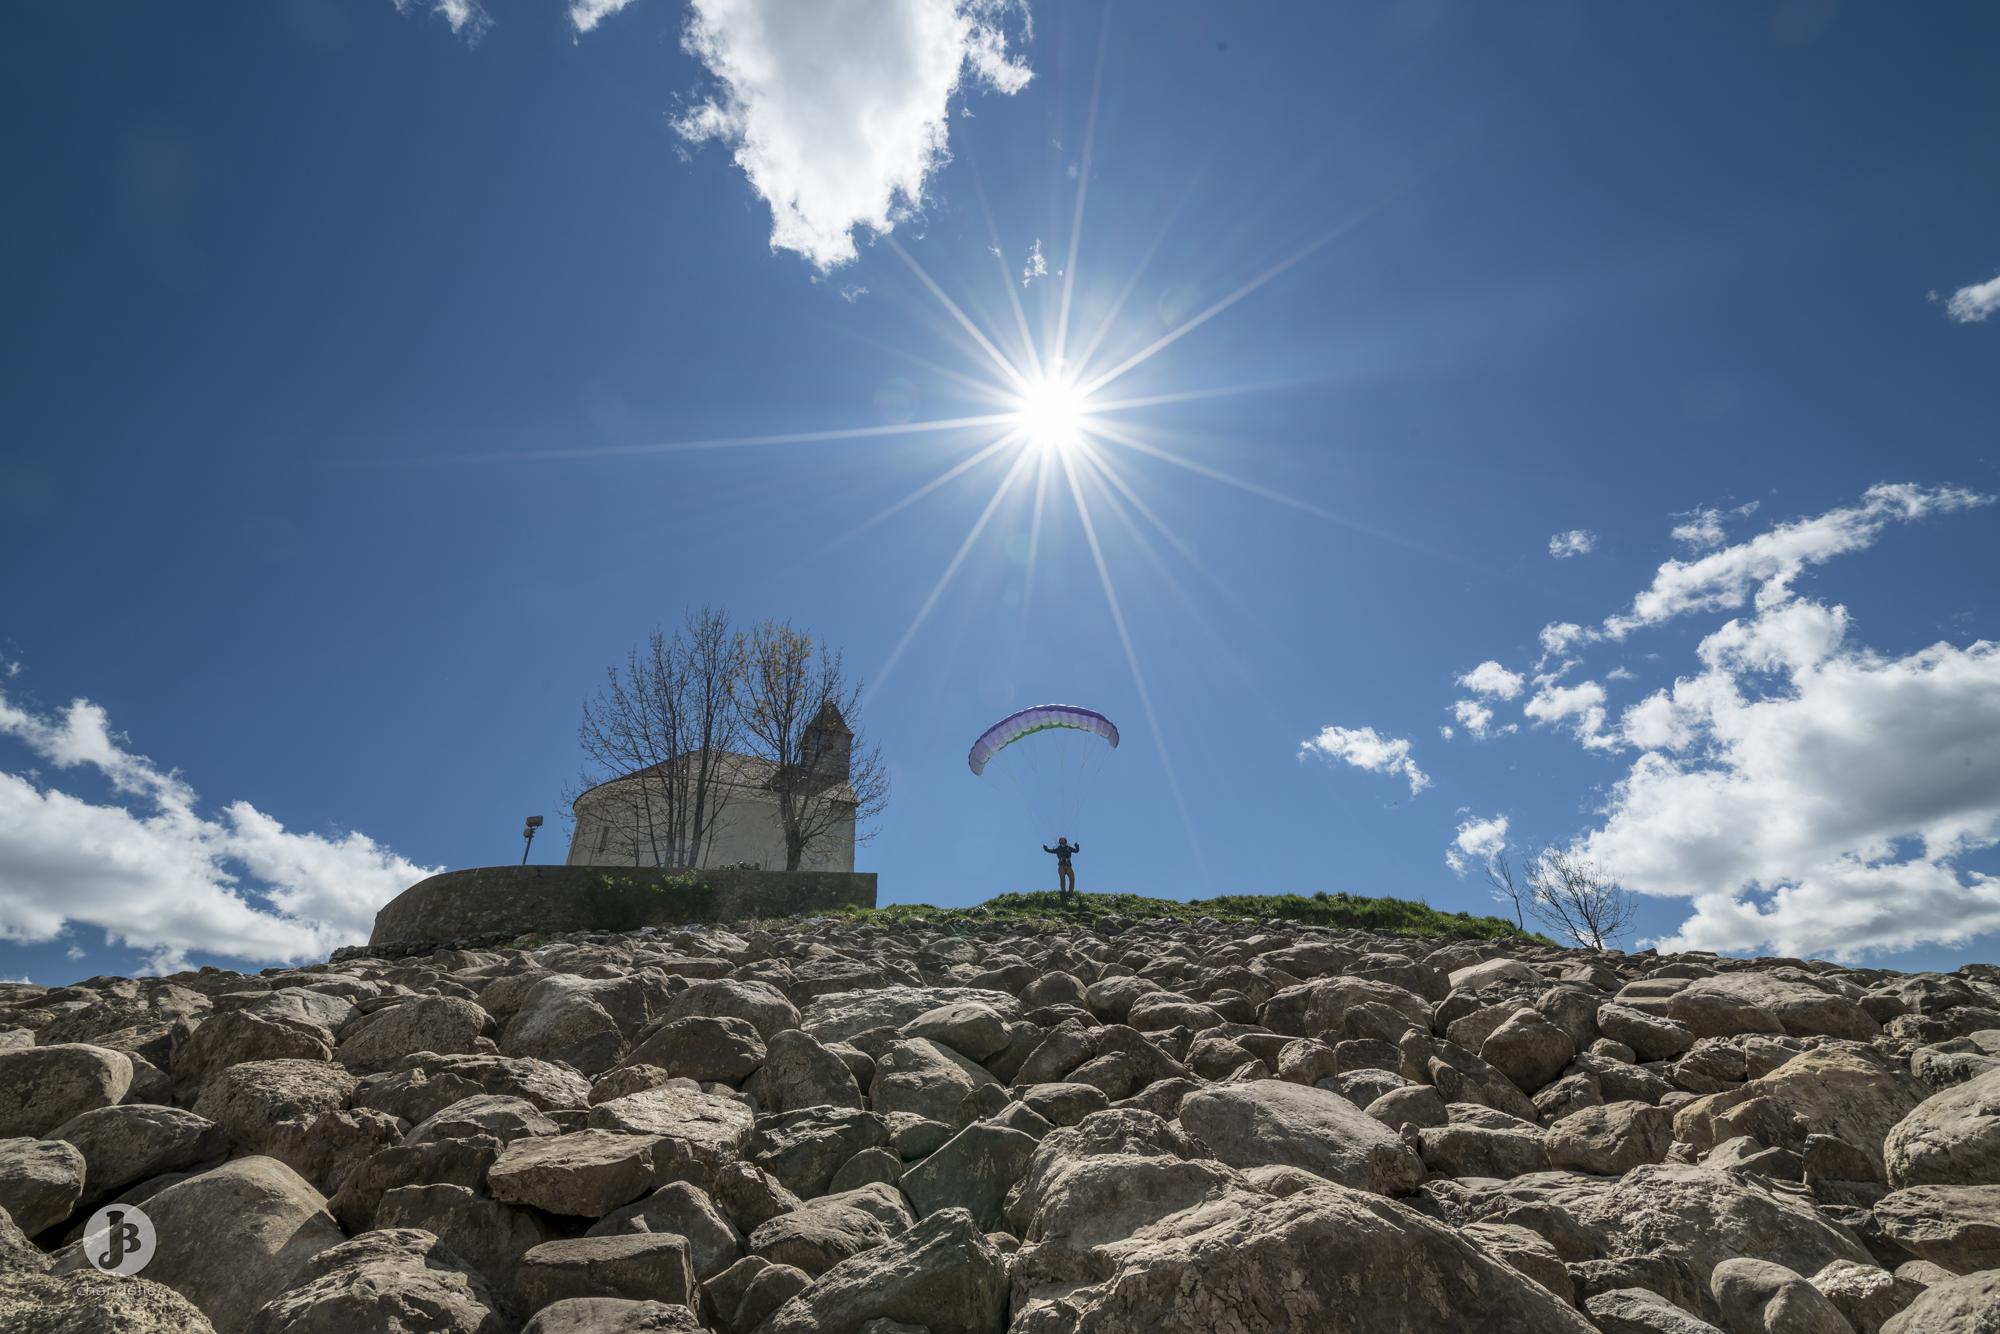 AirG Products Serre poncon parapente paraglide Francois Ragolski photo by Jean batiste Chandelier 4